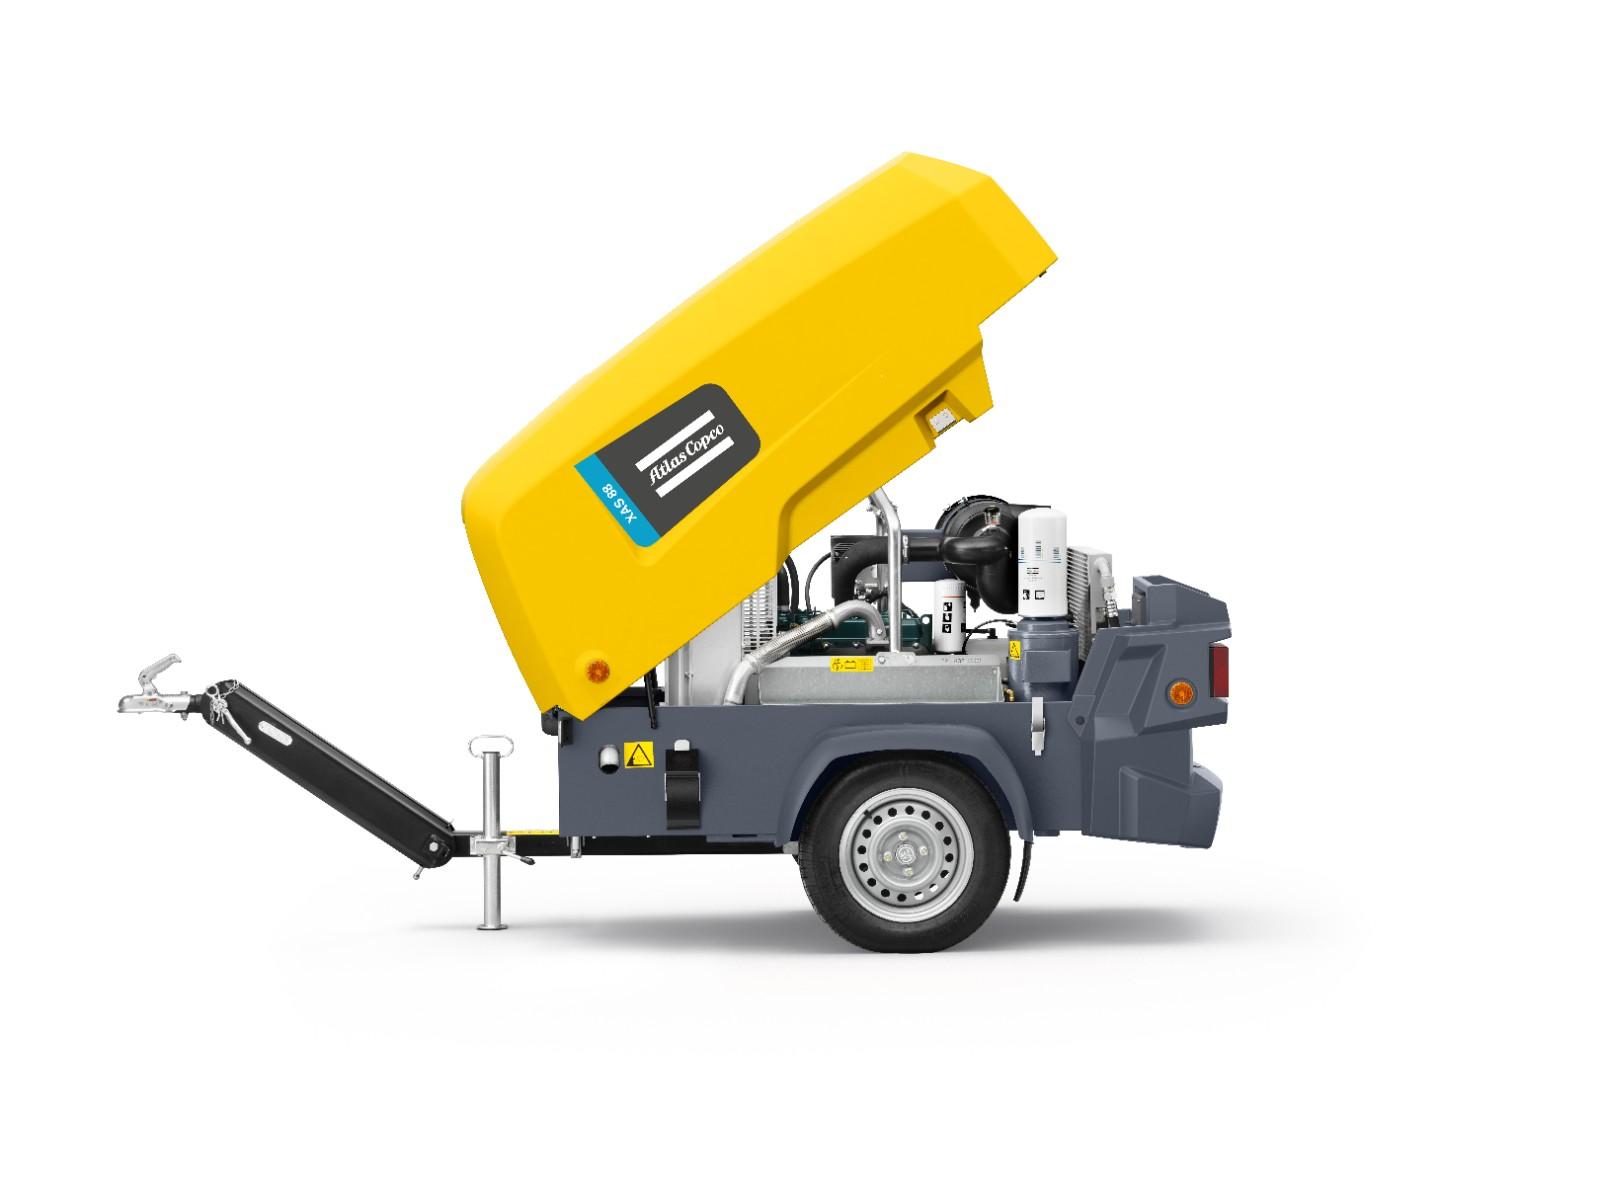 Volume flow: 5m³ – Max. pressure: 7bar – Weight: 649kg – Transport length:  1.94m – Transport width: 1.16m – Transport height: 1.05m. Atlas Copco